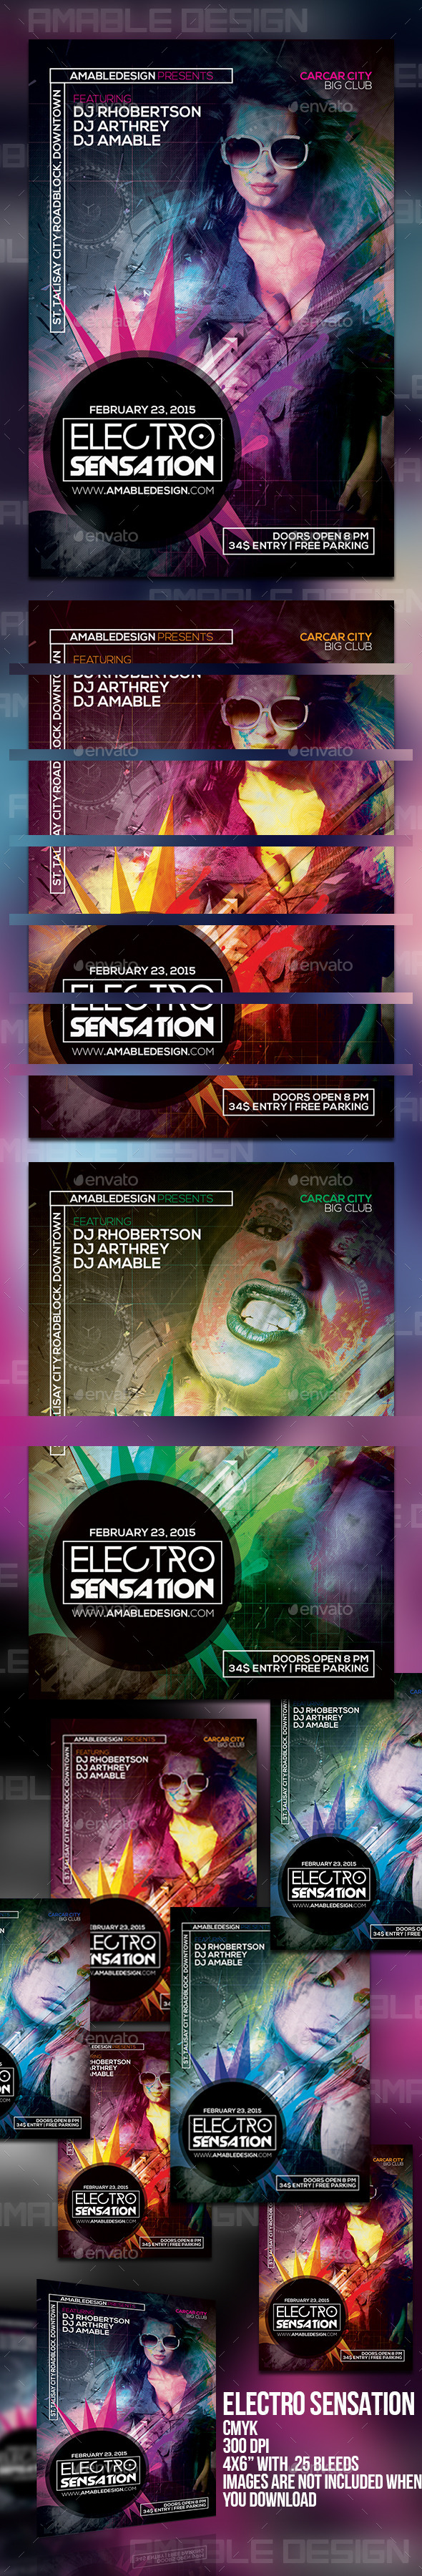 GraphicRiver Electro Sensation Flyer 10190573